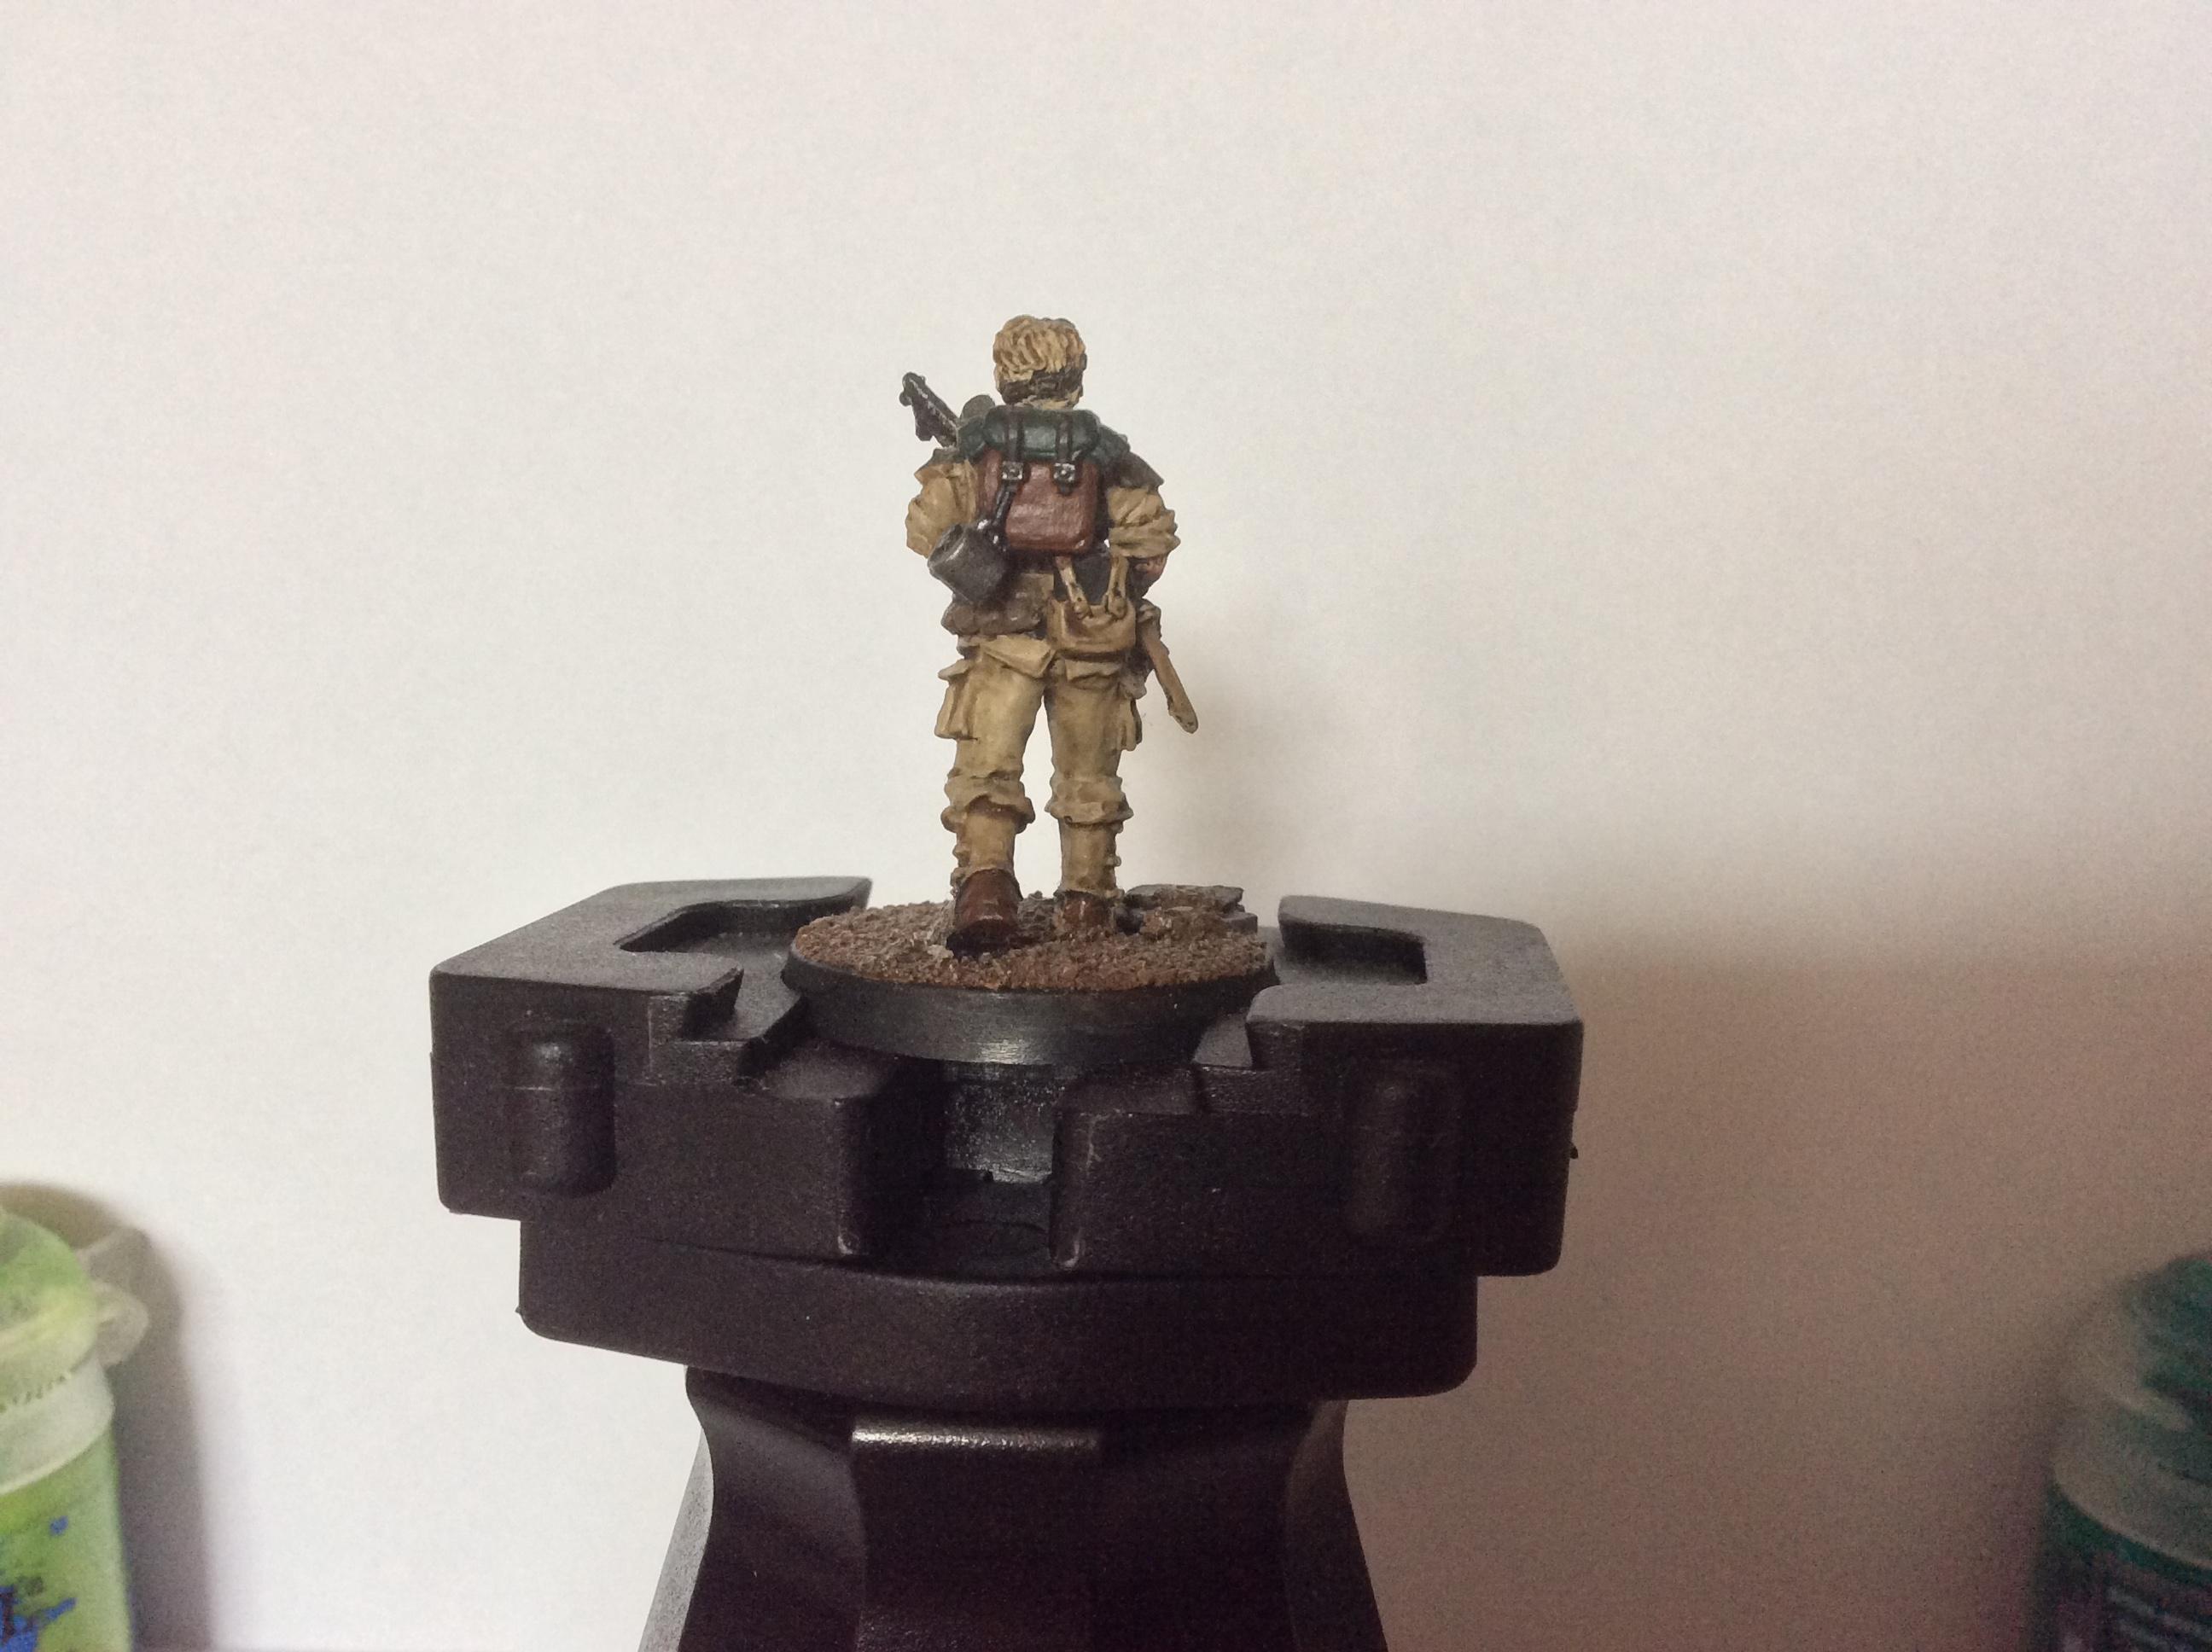 Astra Militarum, Female, Grrrl, Imperial Guard, Minervan Guard, Shotgun, Veteran, Victoria Miniatures, Warhammer 40,000